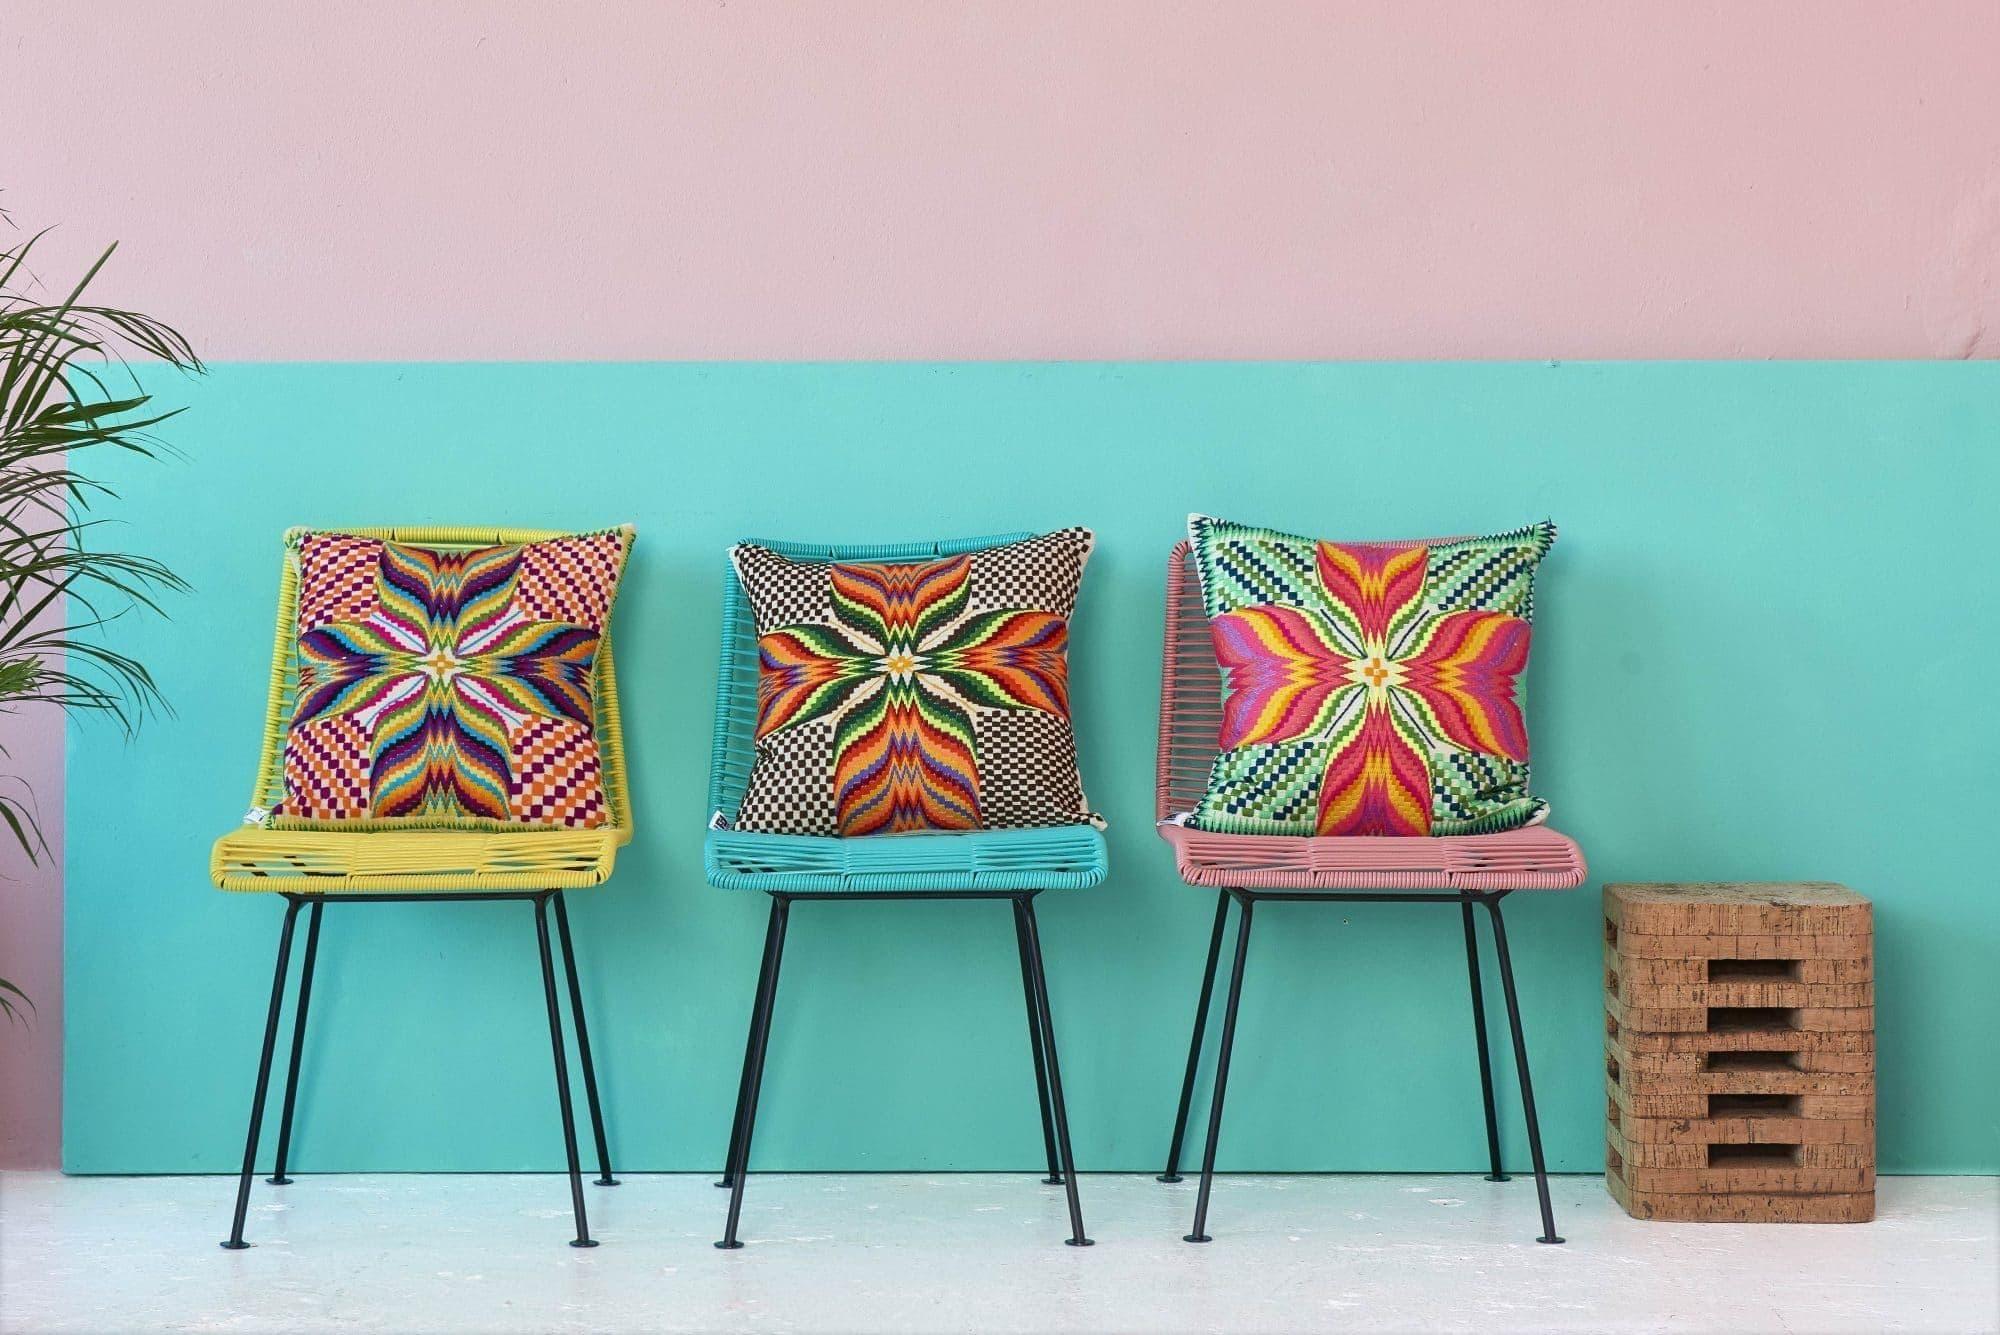 Rosarito stoelen op rij Fair Furniture